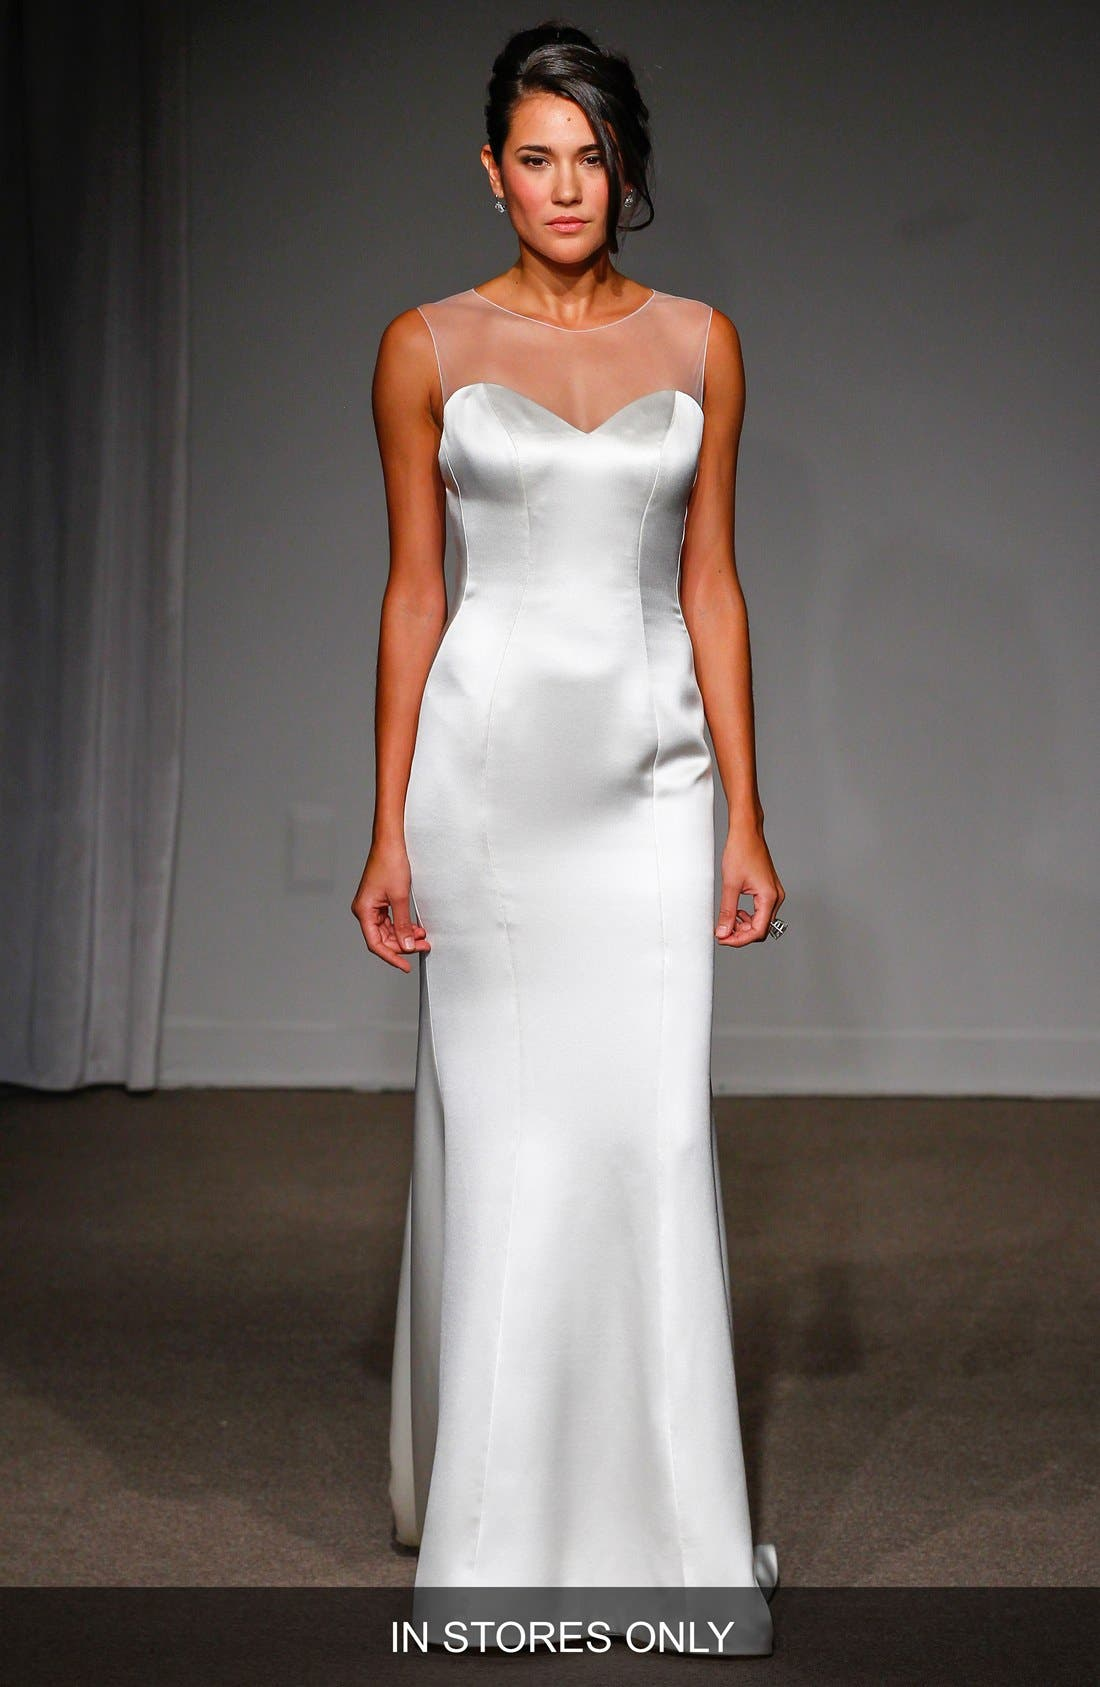 Nicole Illusion Neck Satin A-Line Gown,                         Main,                         color, 100